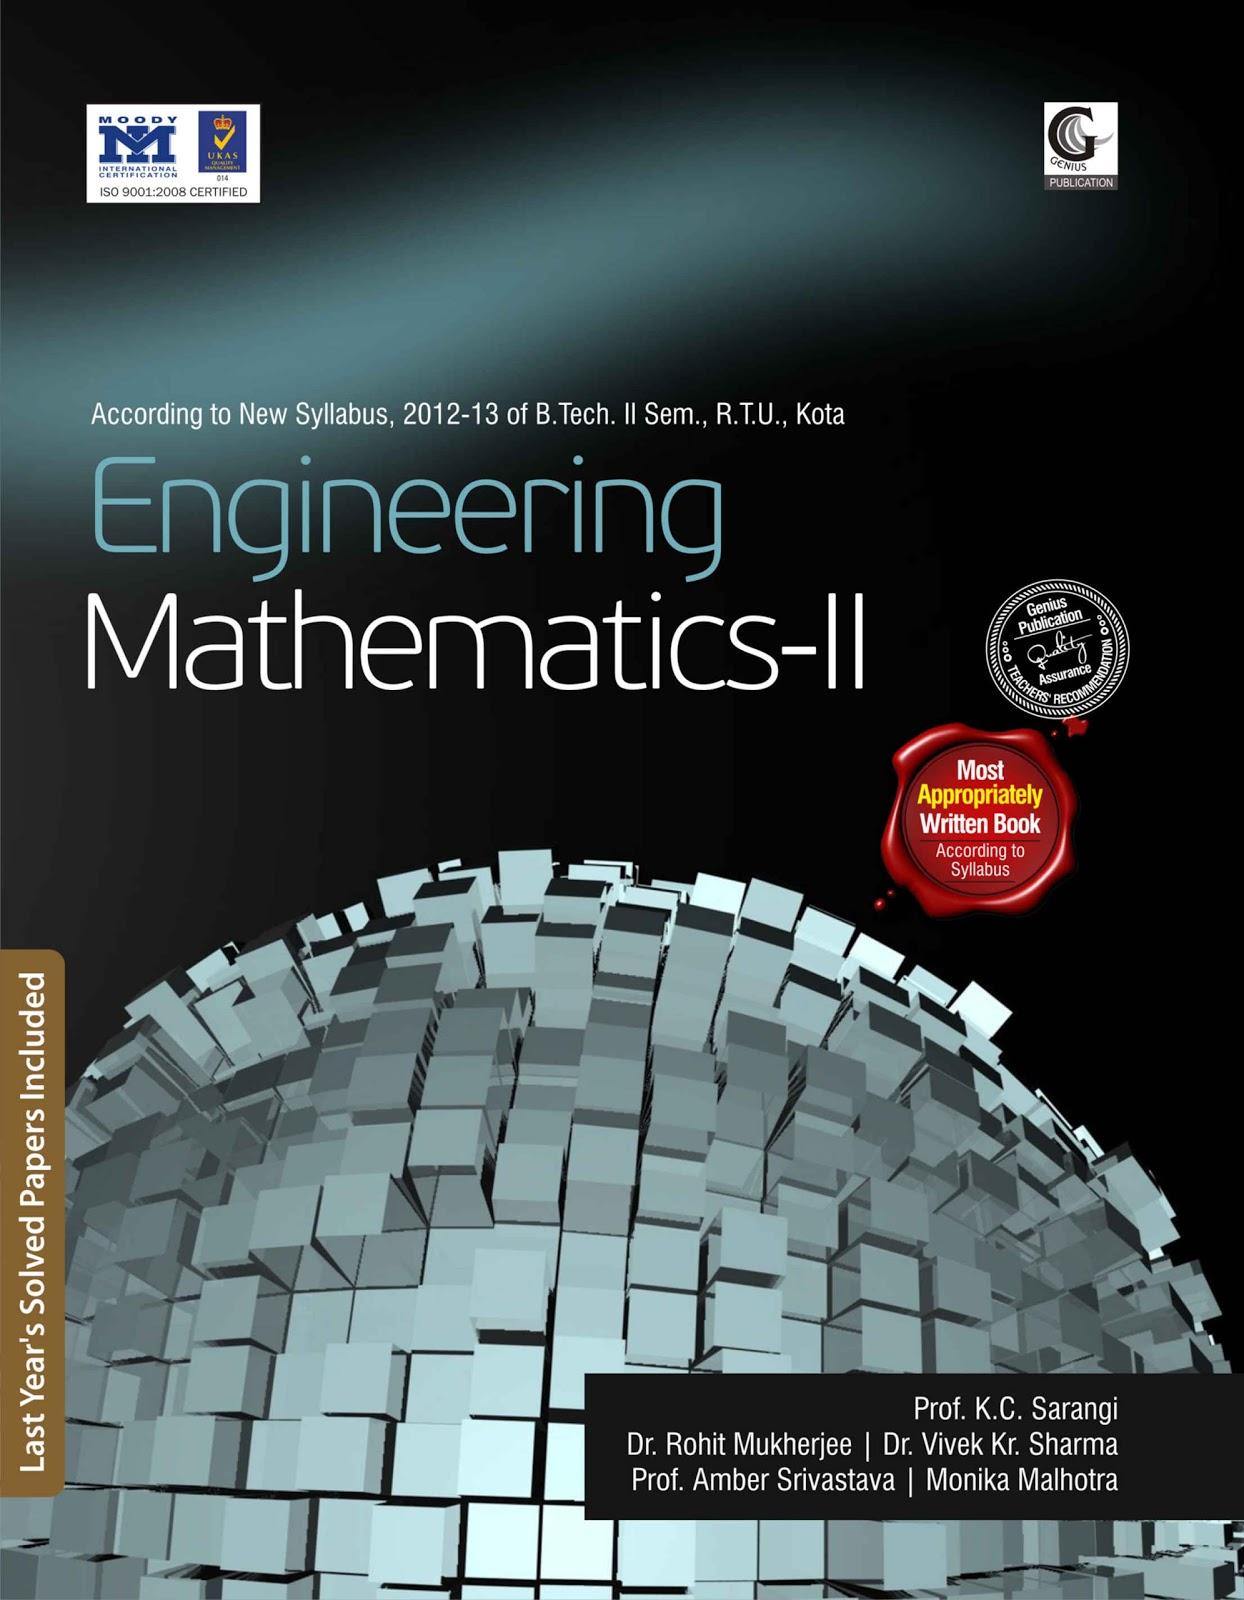 engineering mathematics 1 book written by g balaji Engineering mathematics 1 by g balaji download engineering mathematics 1 by pdfengineering mathematics - wikipedia science, technology, engineering, and mathematics - wikipediacivil.